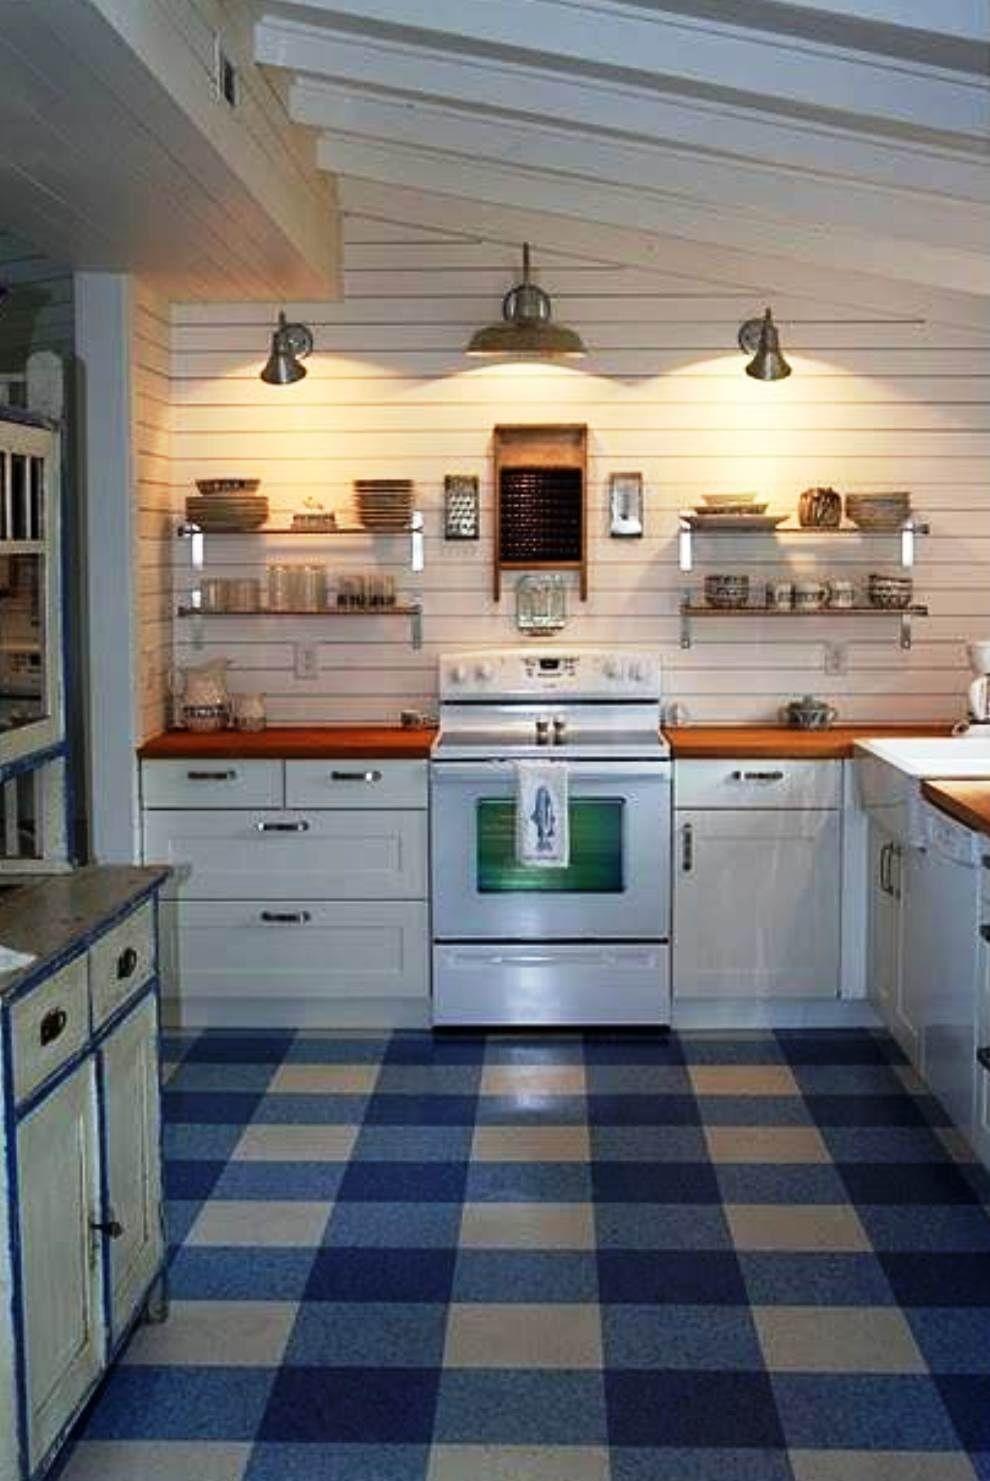 Kitchen floor linoleum gingham cottage project pinterest flooring blue pattern linoleum tile floor for kitchen flooring benefits of linoleum floor dailygadgetfo Choice Image